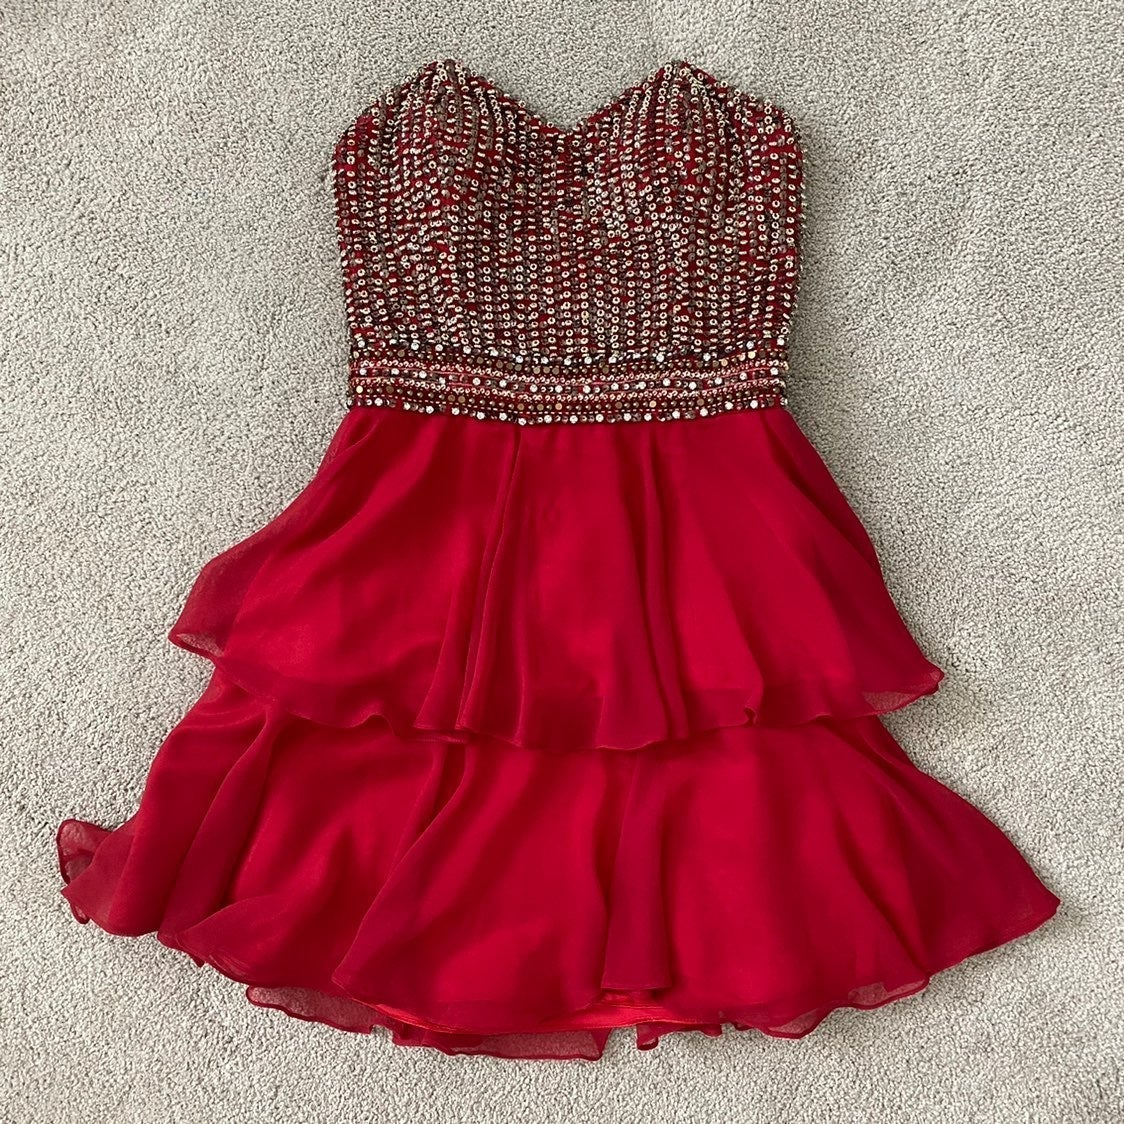 SHAIL K Homecoming/Prom Dress